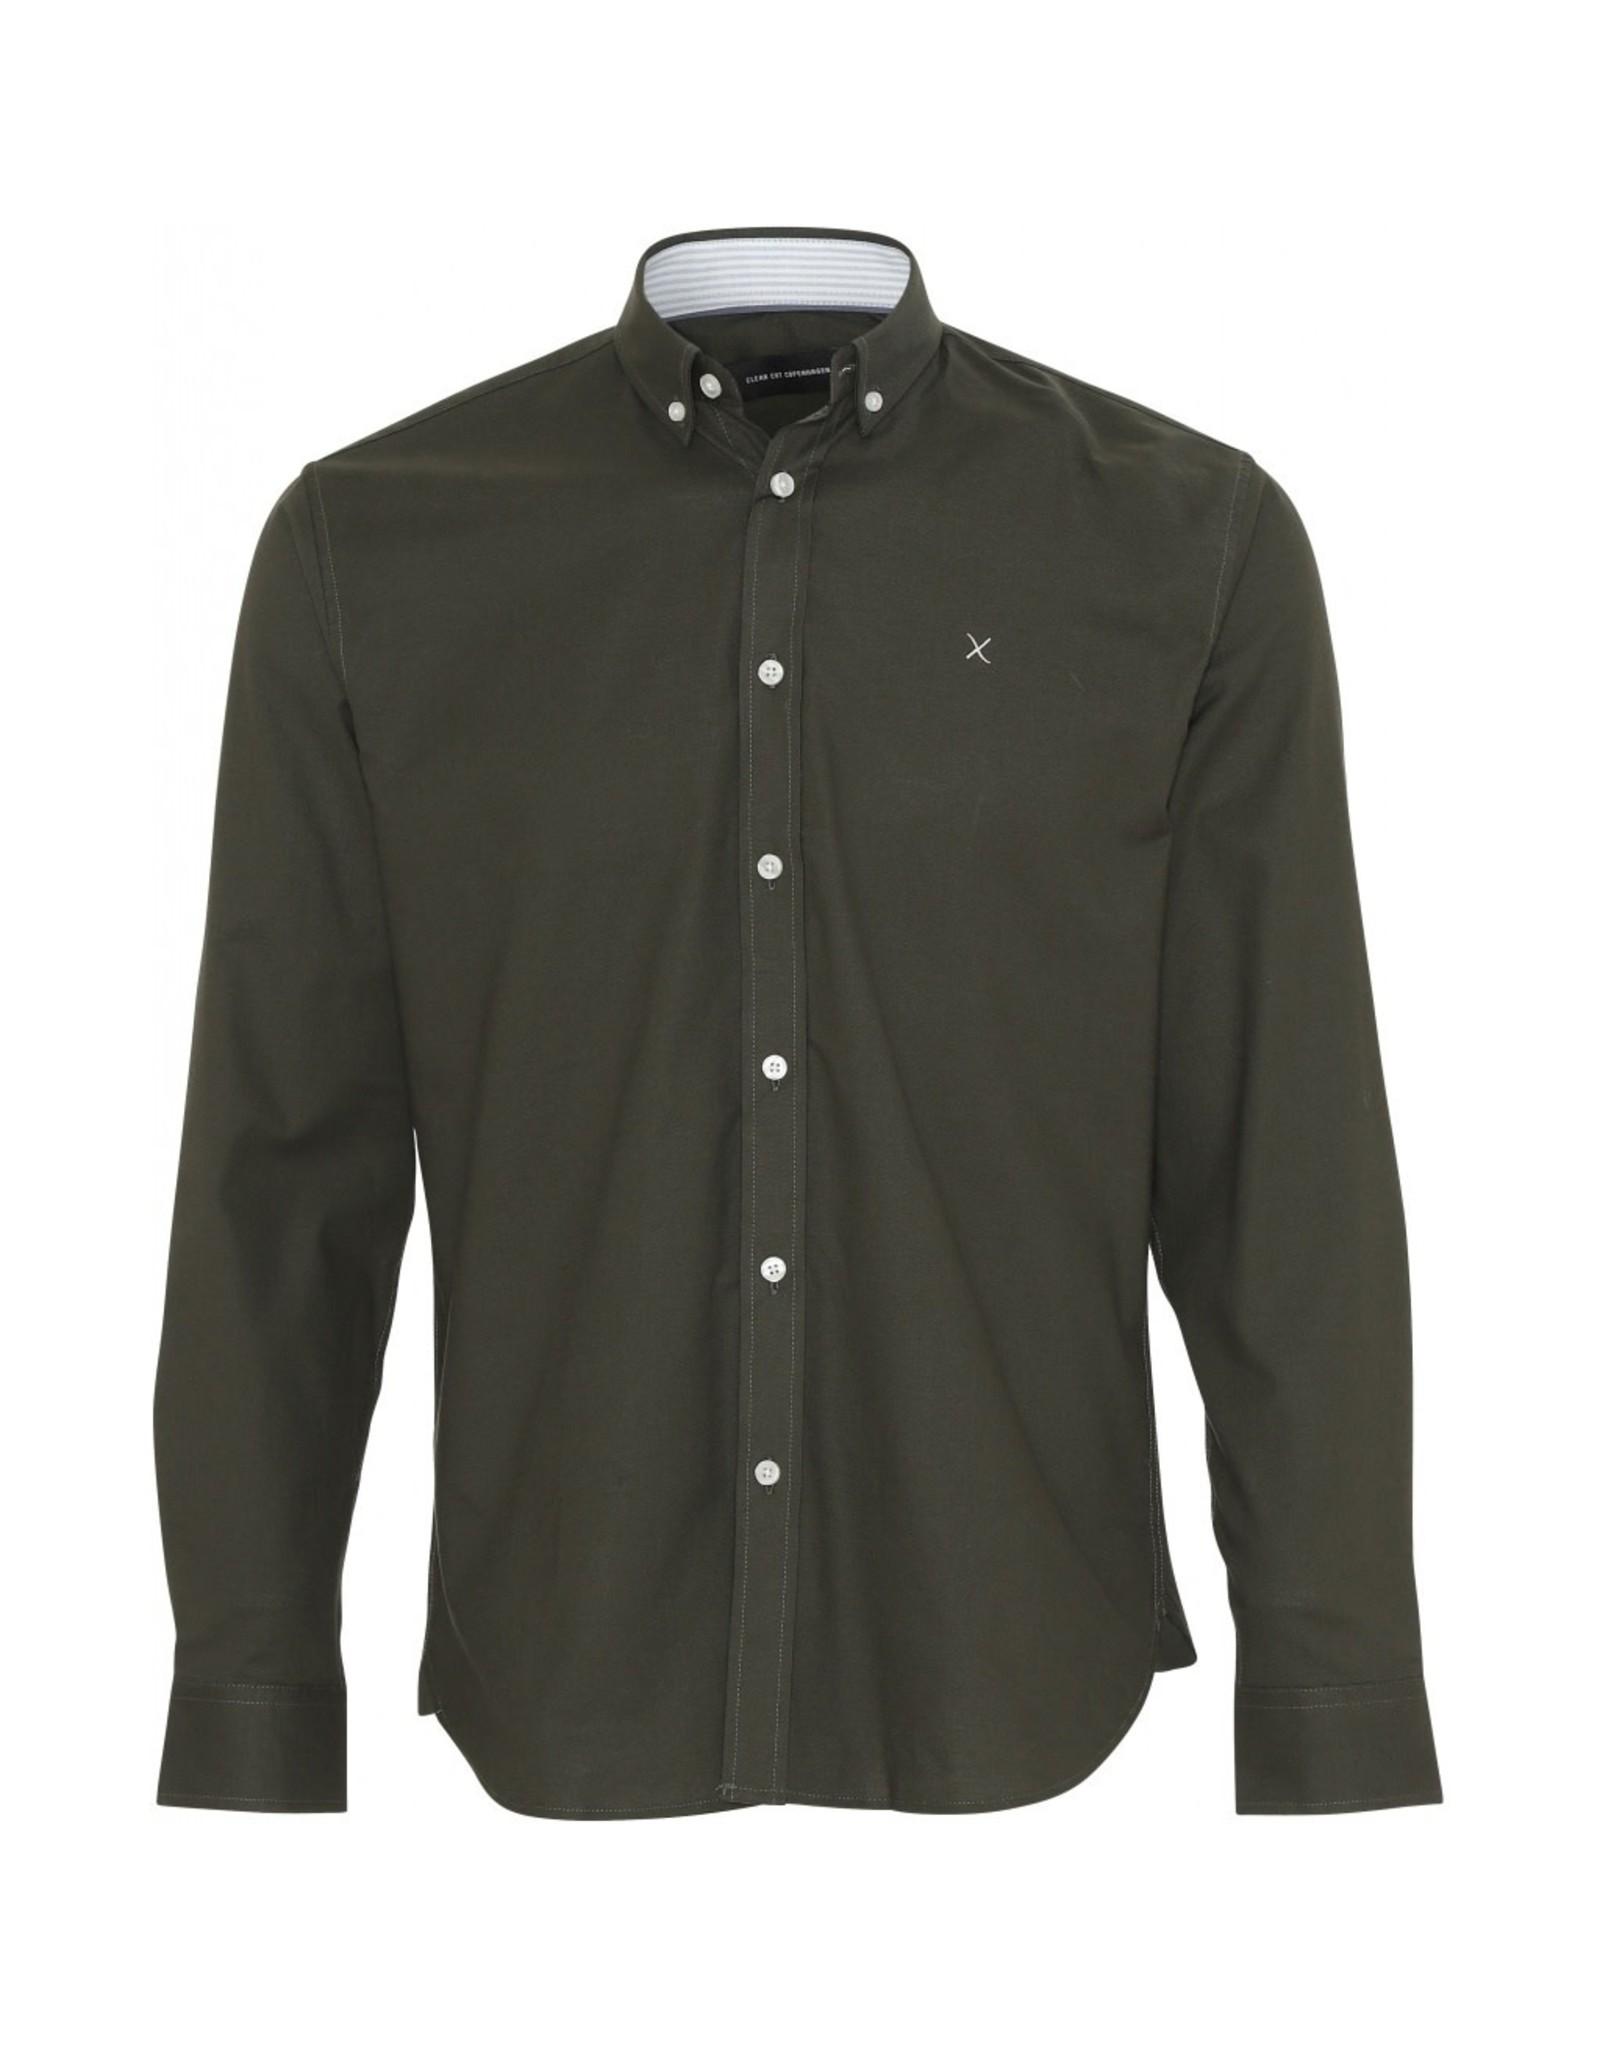 Clean Cut Copenhagen Oxford Plain Shirt